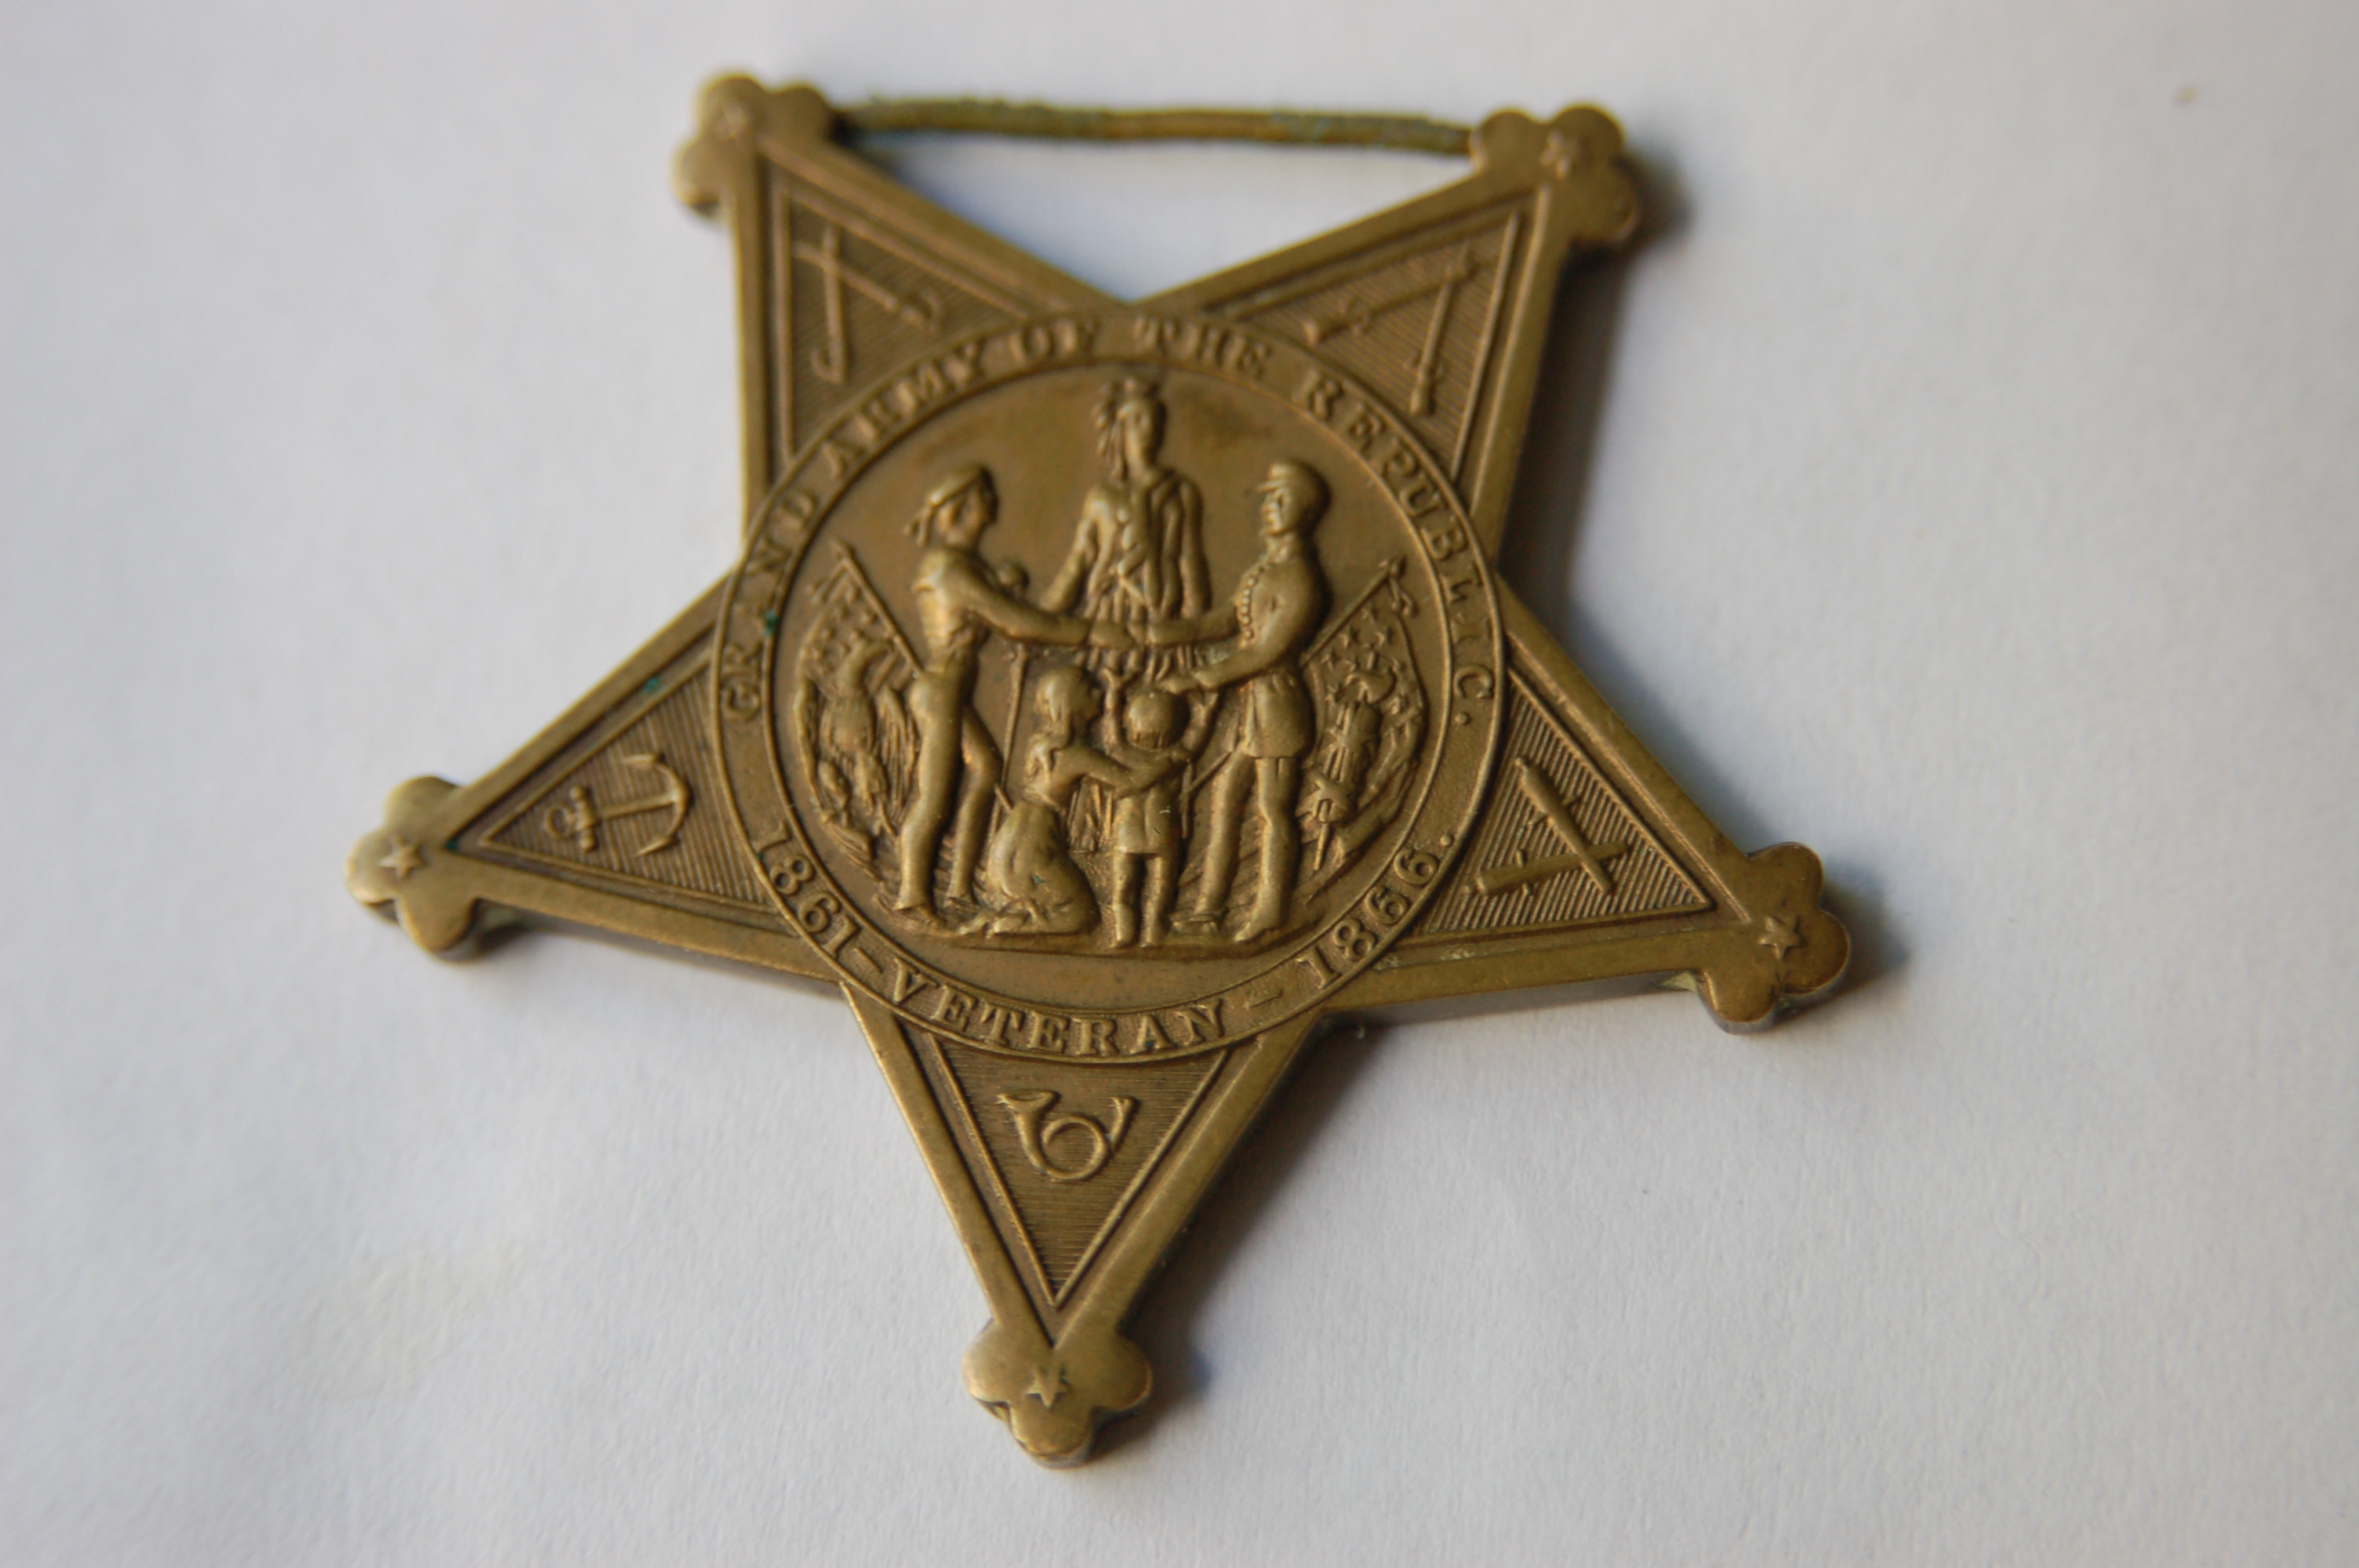 Civil War Grand Army of the Republic Veterans Star